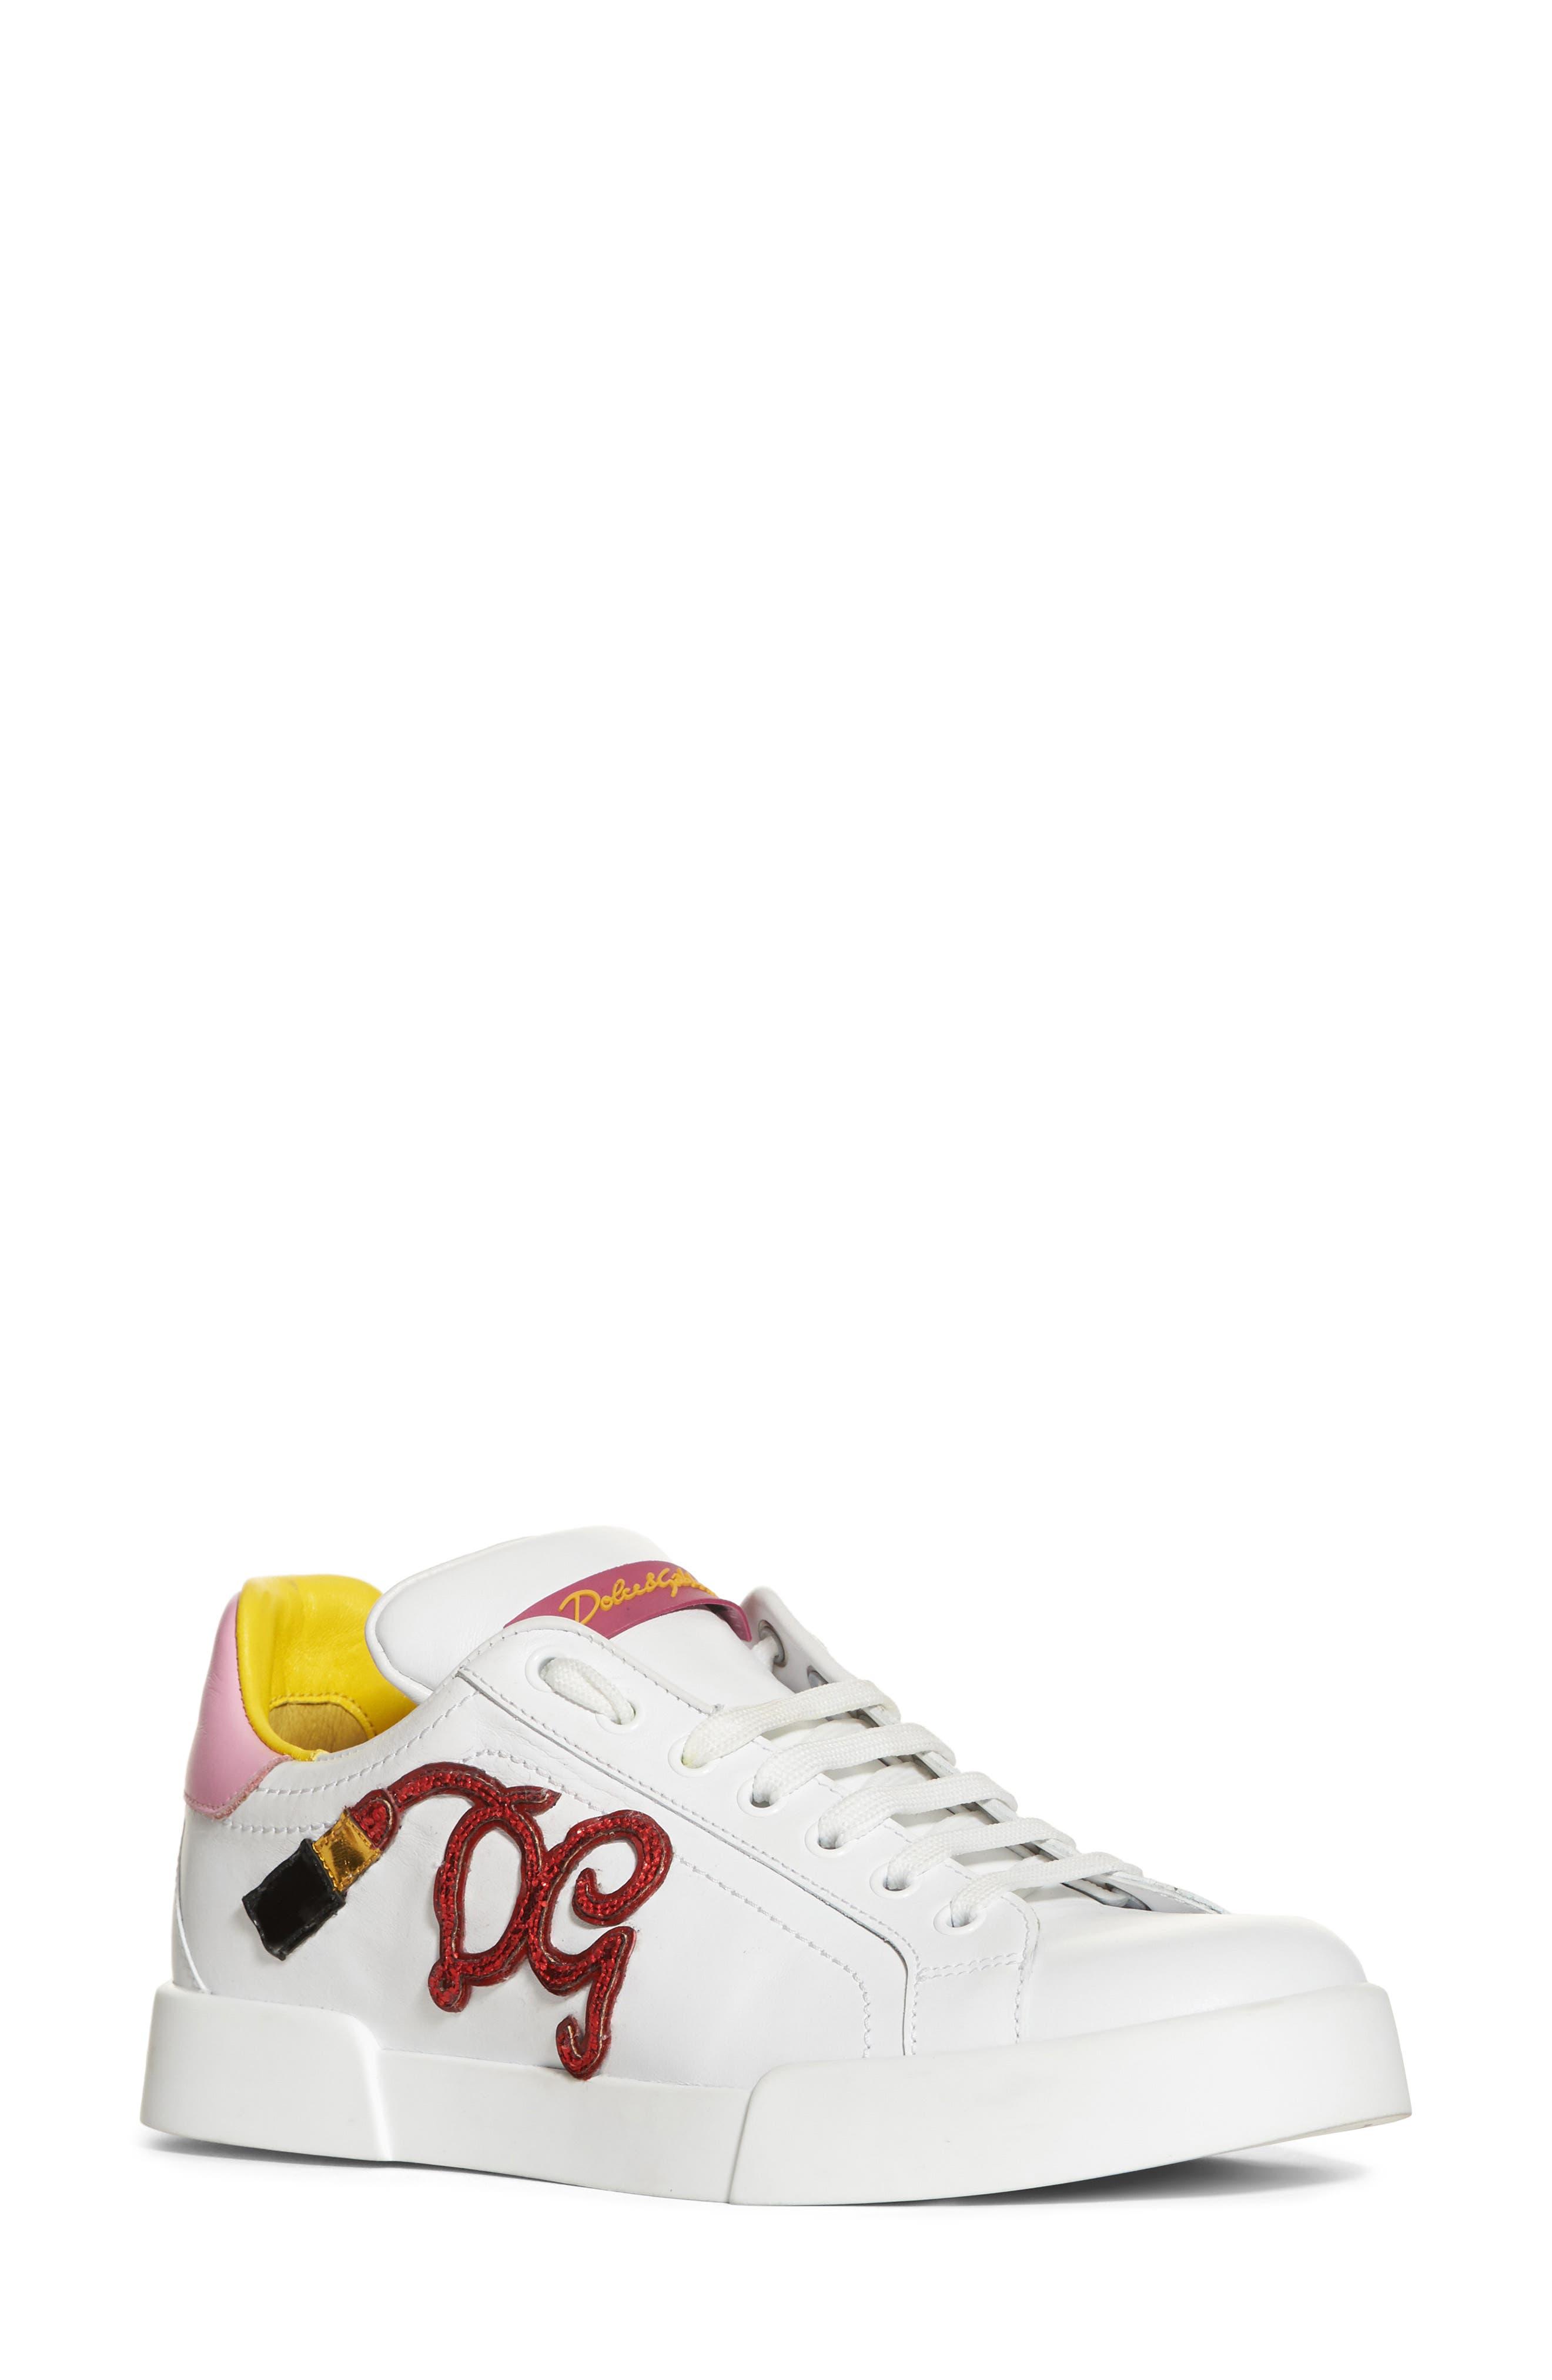 Lipstick Sneaker,                             Main thumbnail 1, color,                             White/ Pink